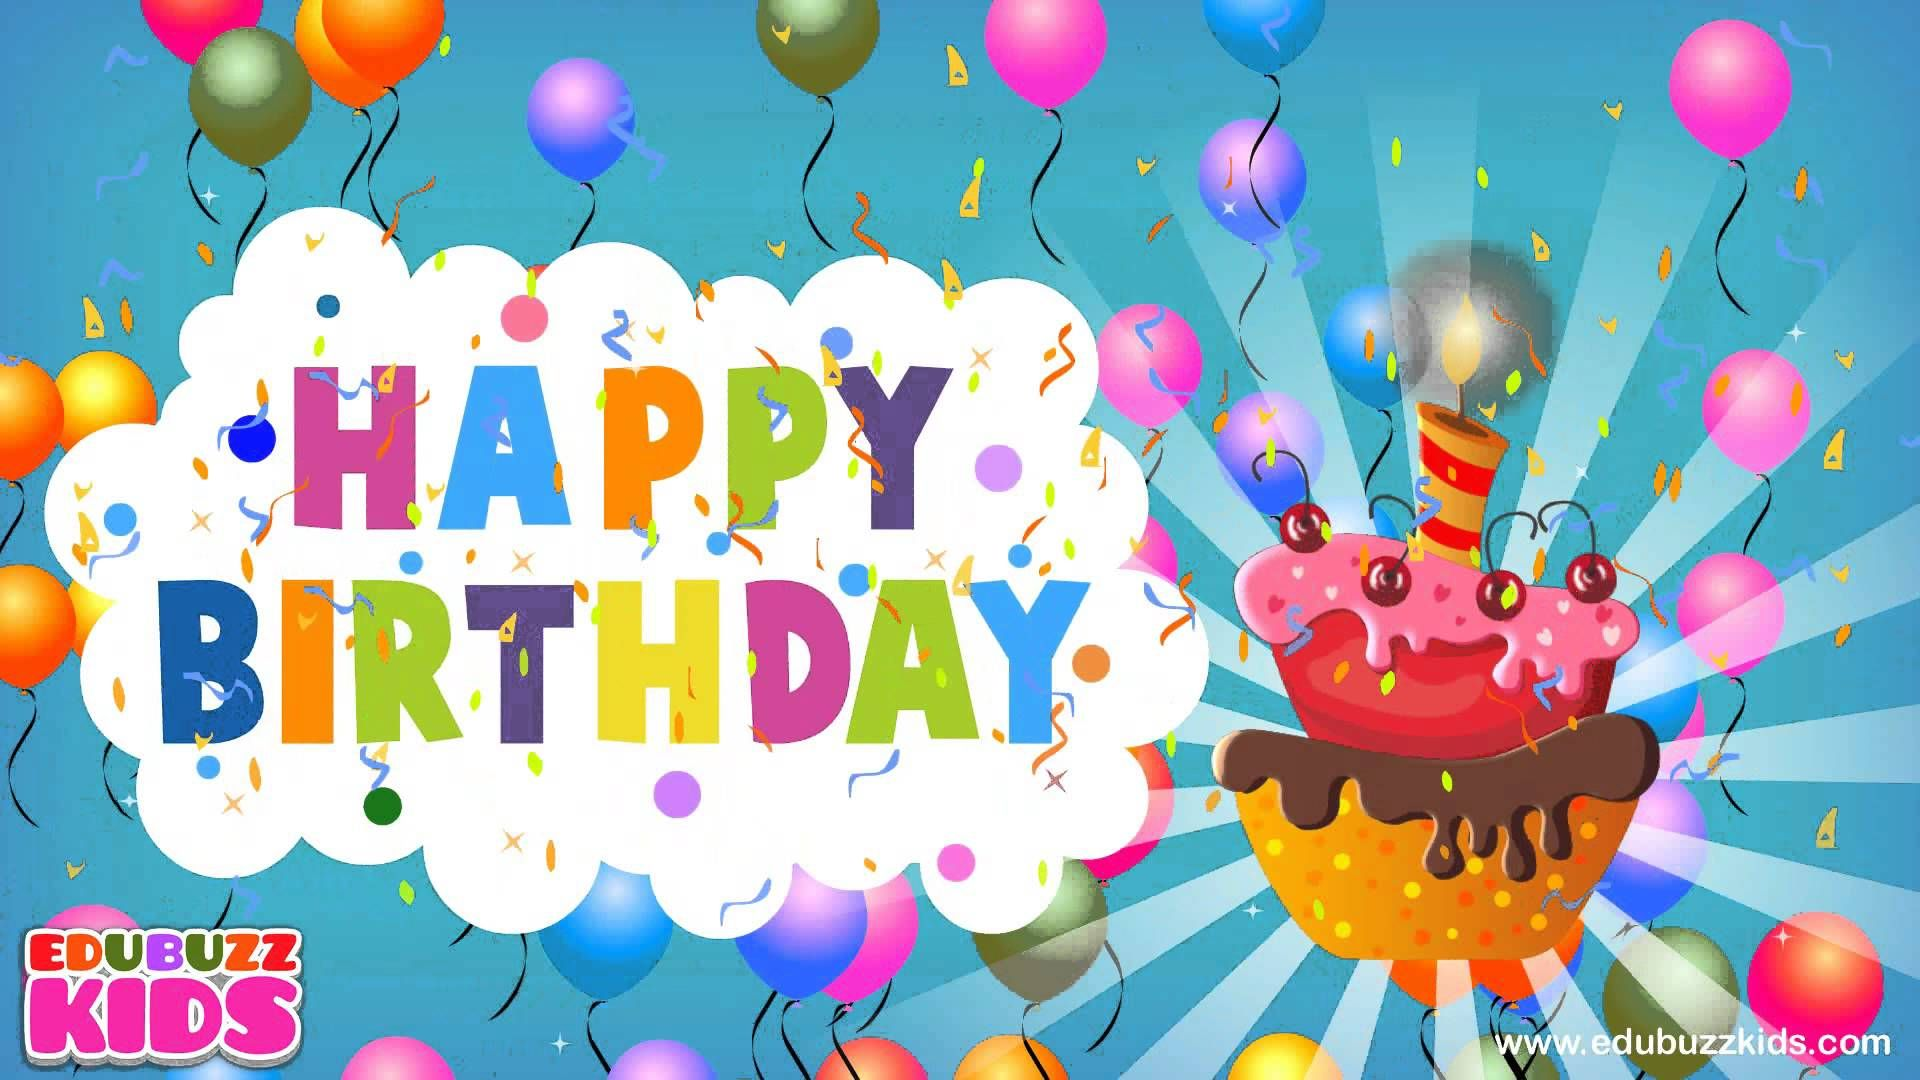 Happy Birthday Song Traditional Happy Birthday Song Birthday Songs Happy Birthday Balloons